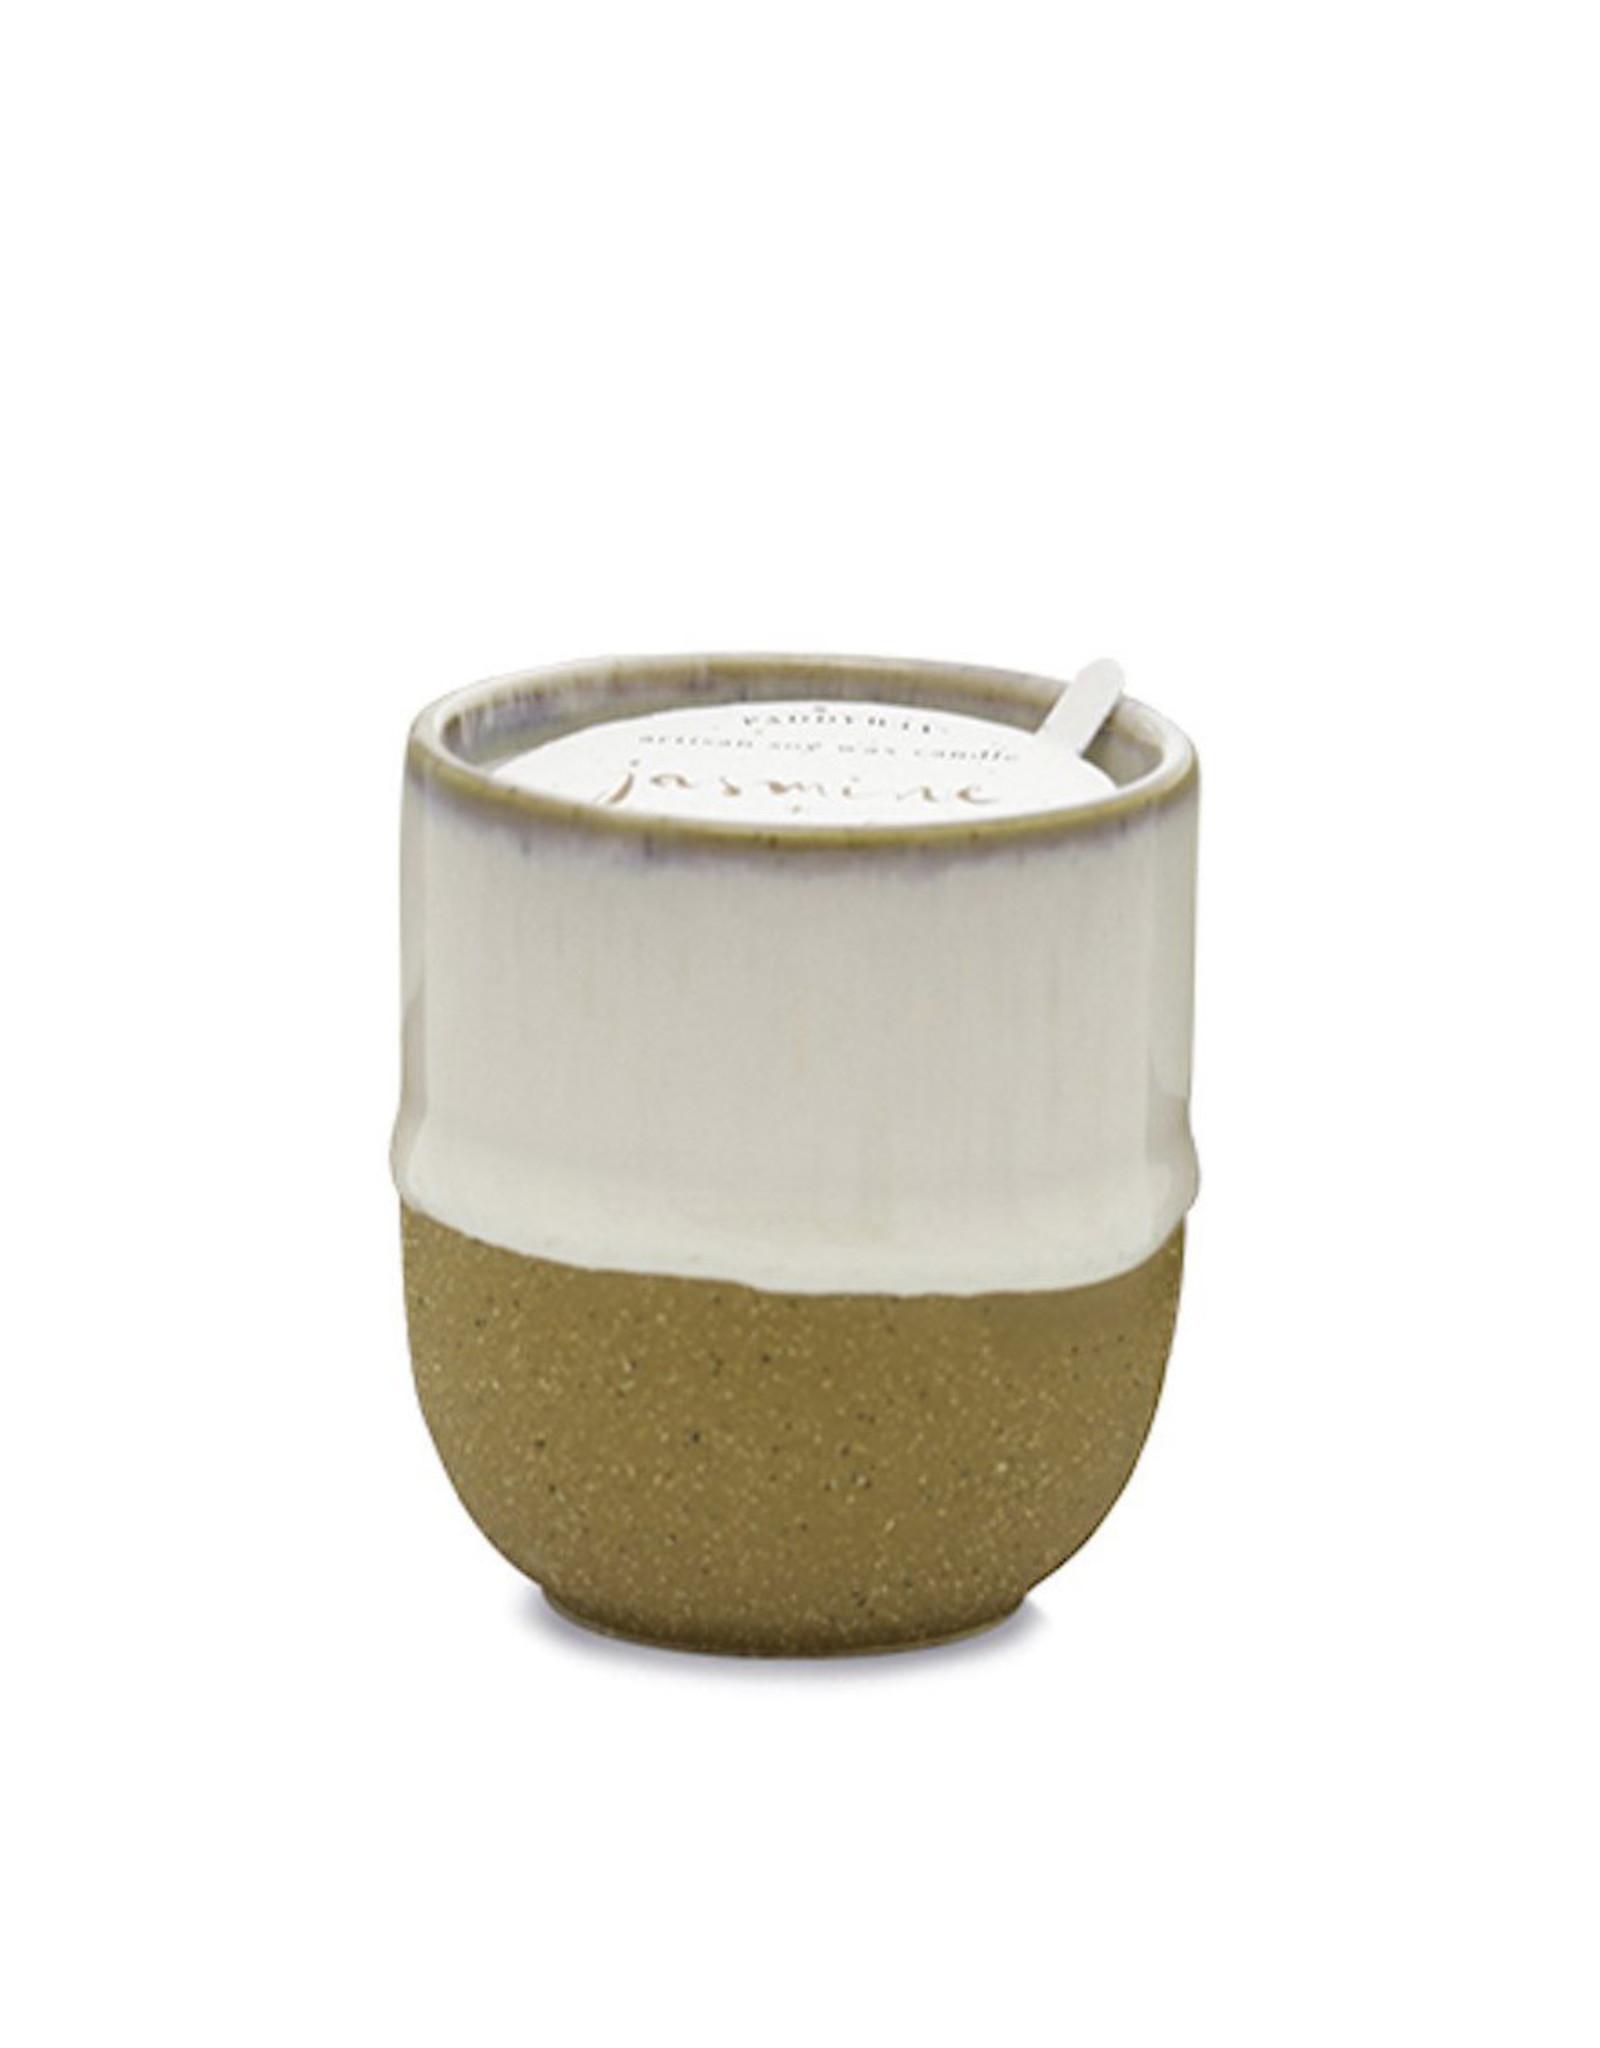 Paddywax Kin Candle - Jasmine Bamboo, 3.5oz  by Paddywax